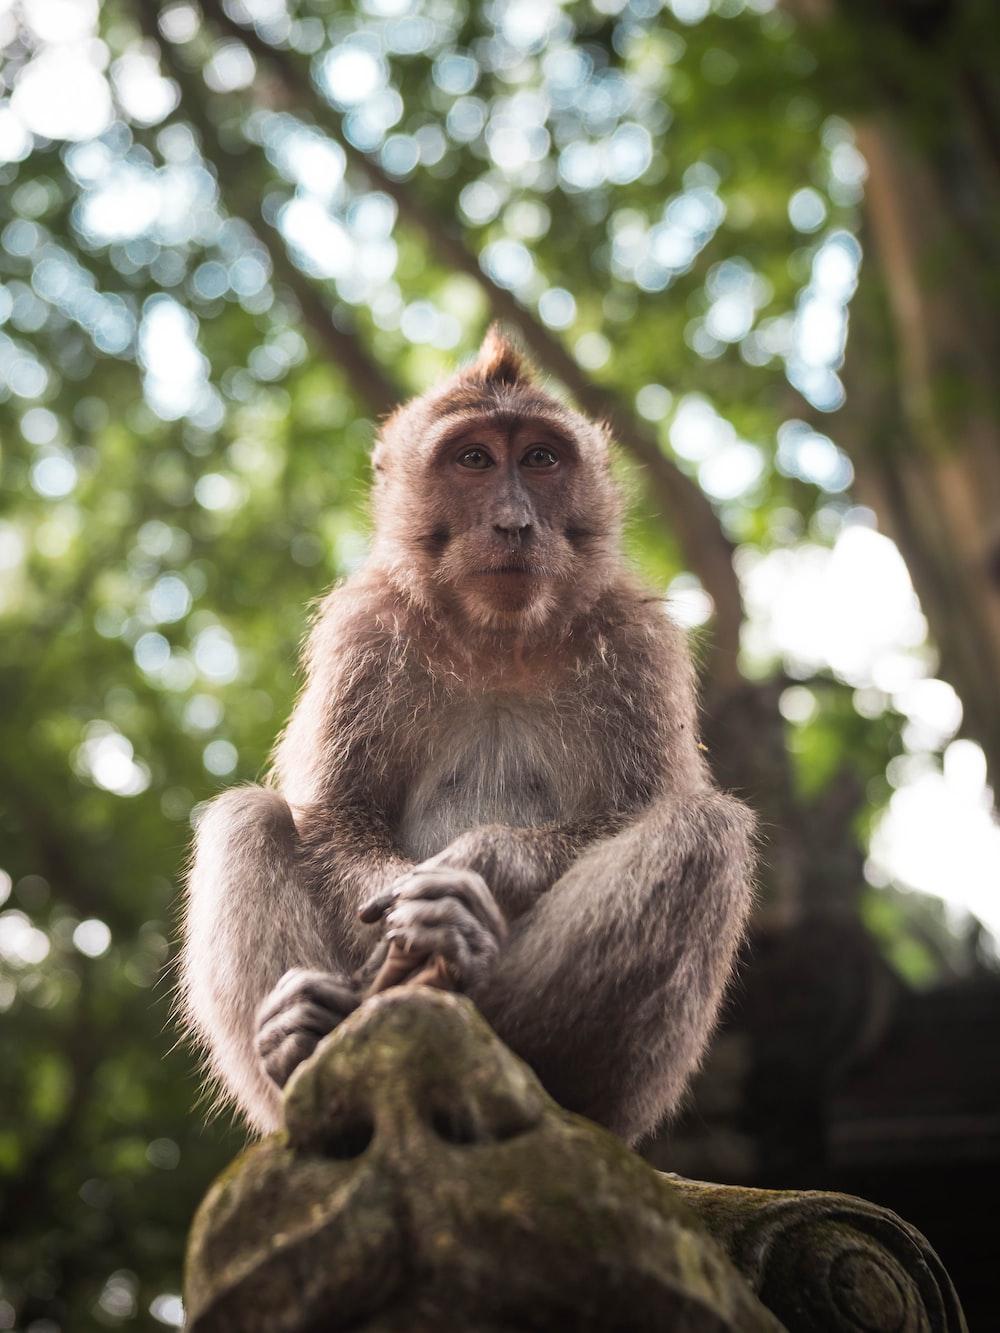 selective focus photo of monkey on tree